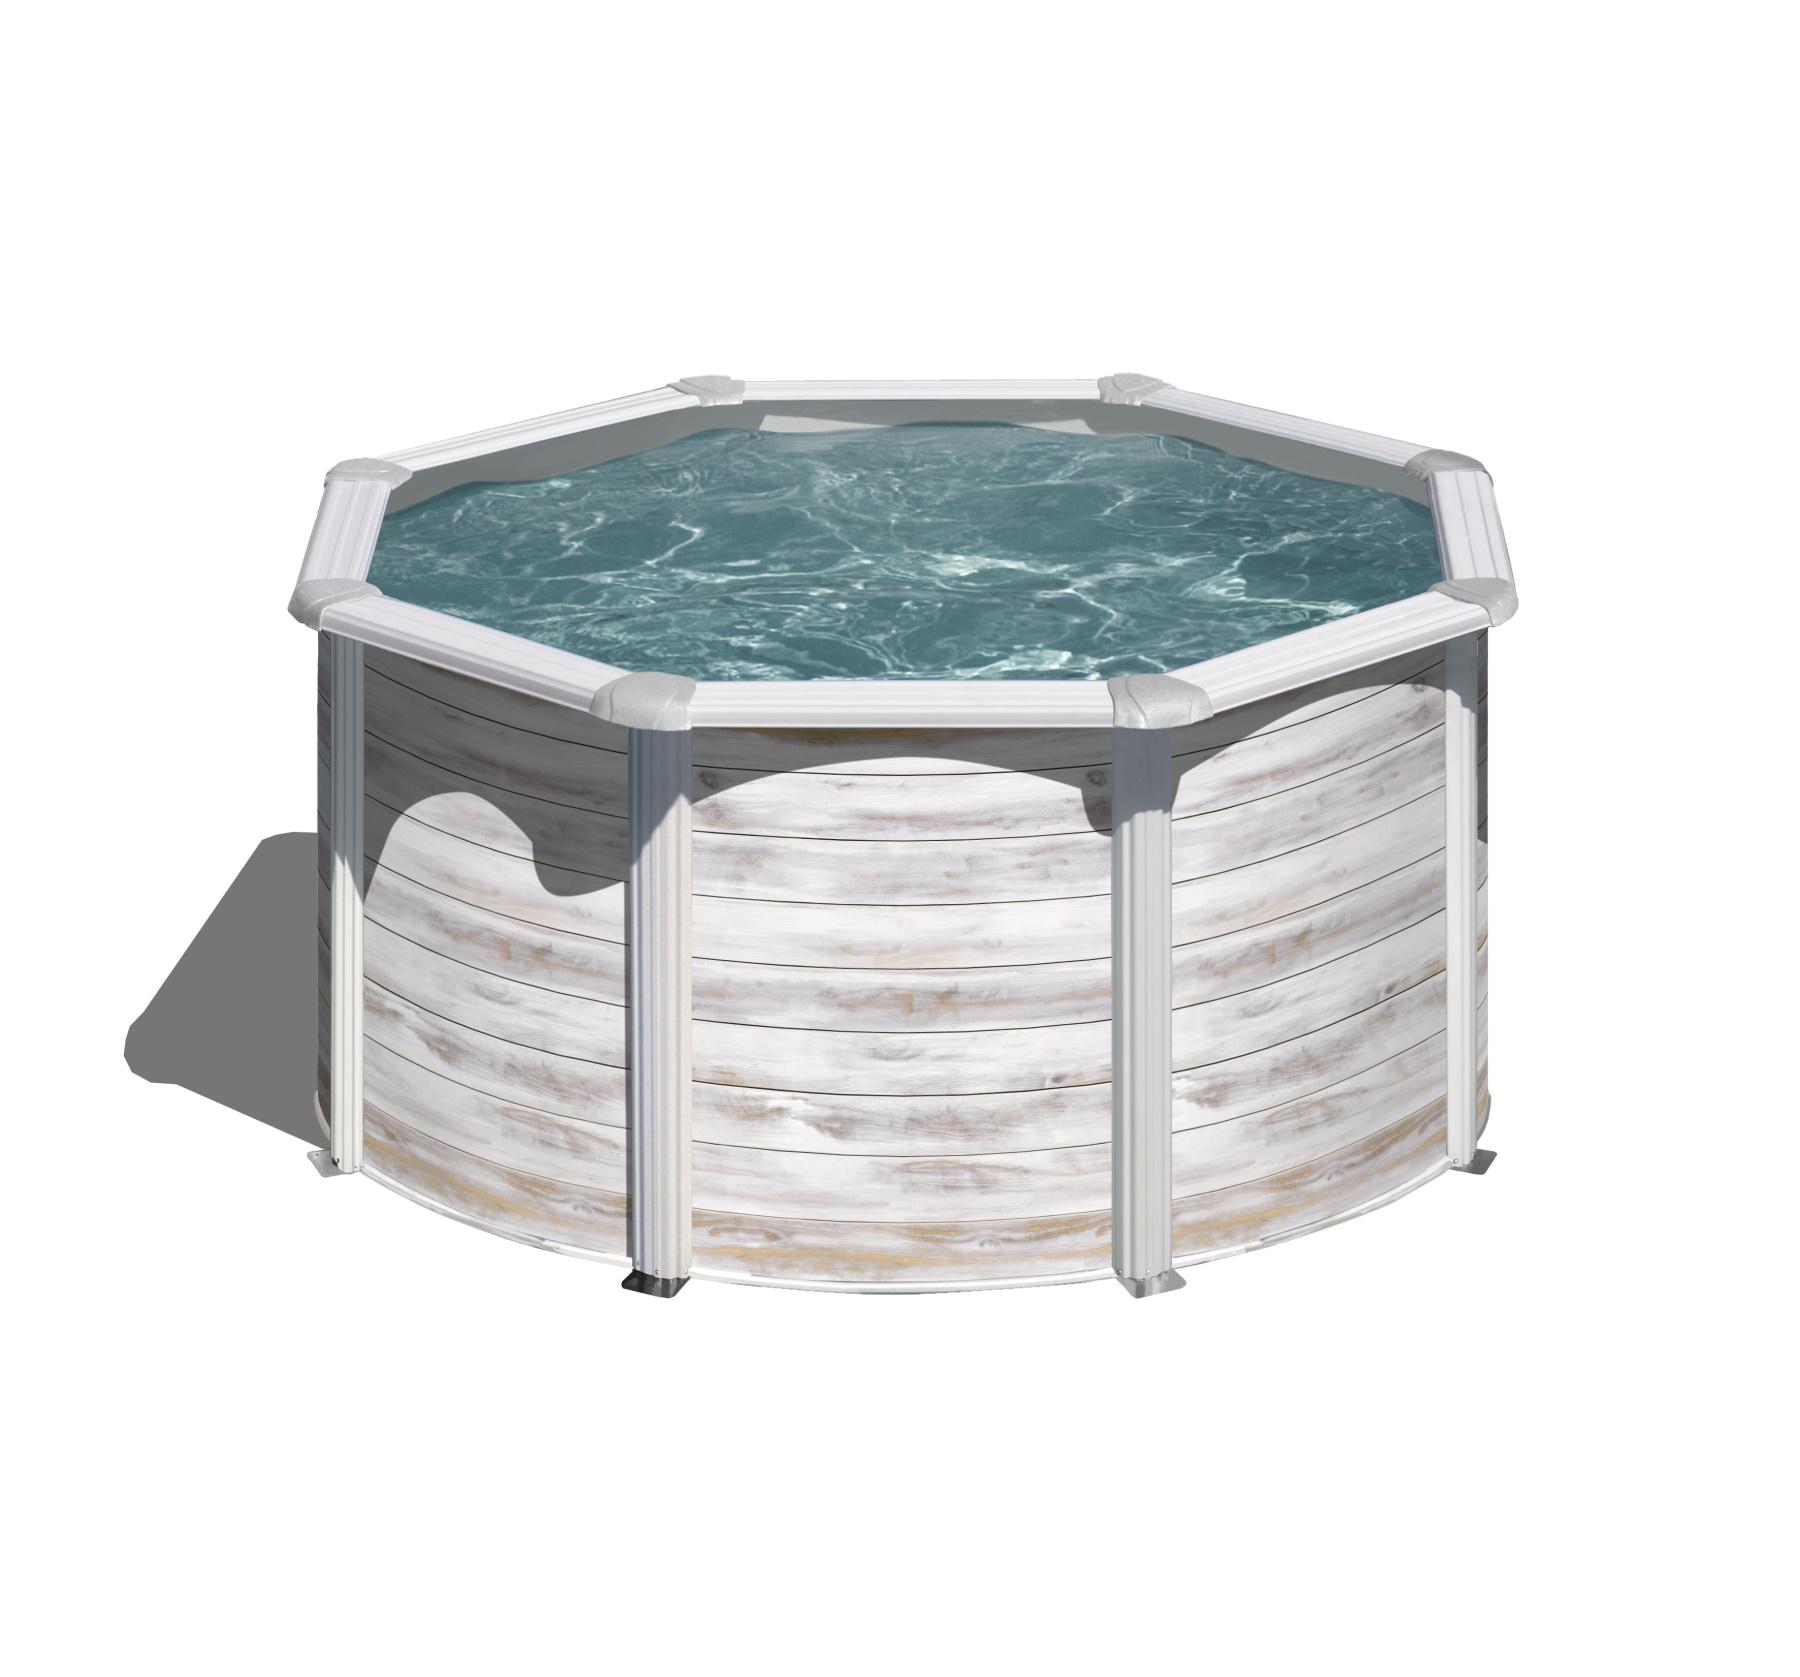 NORDC-22 gre bazeni